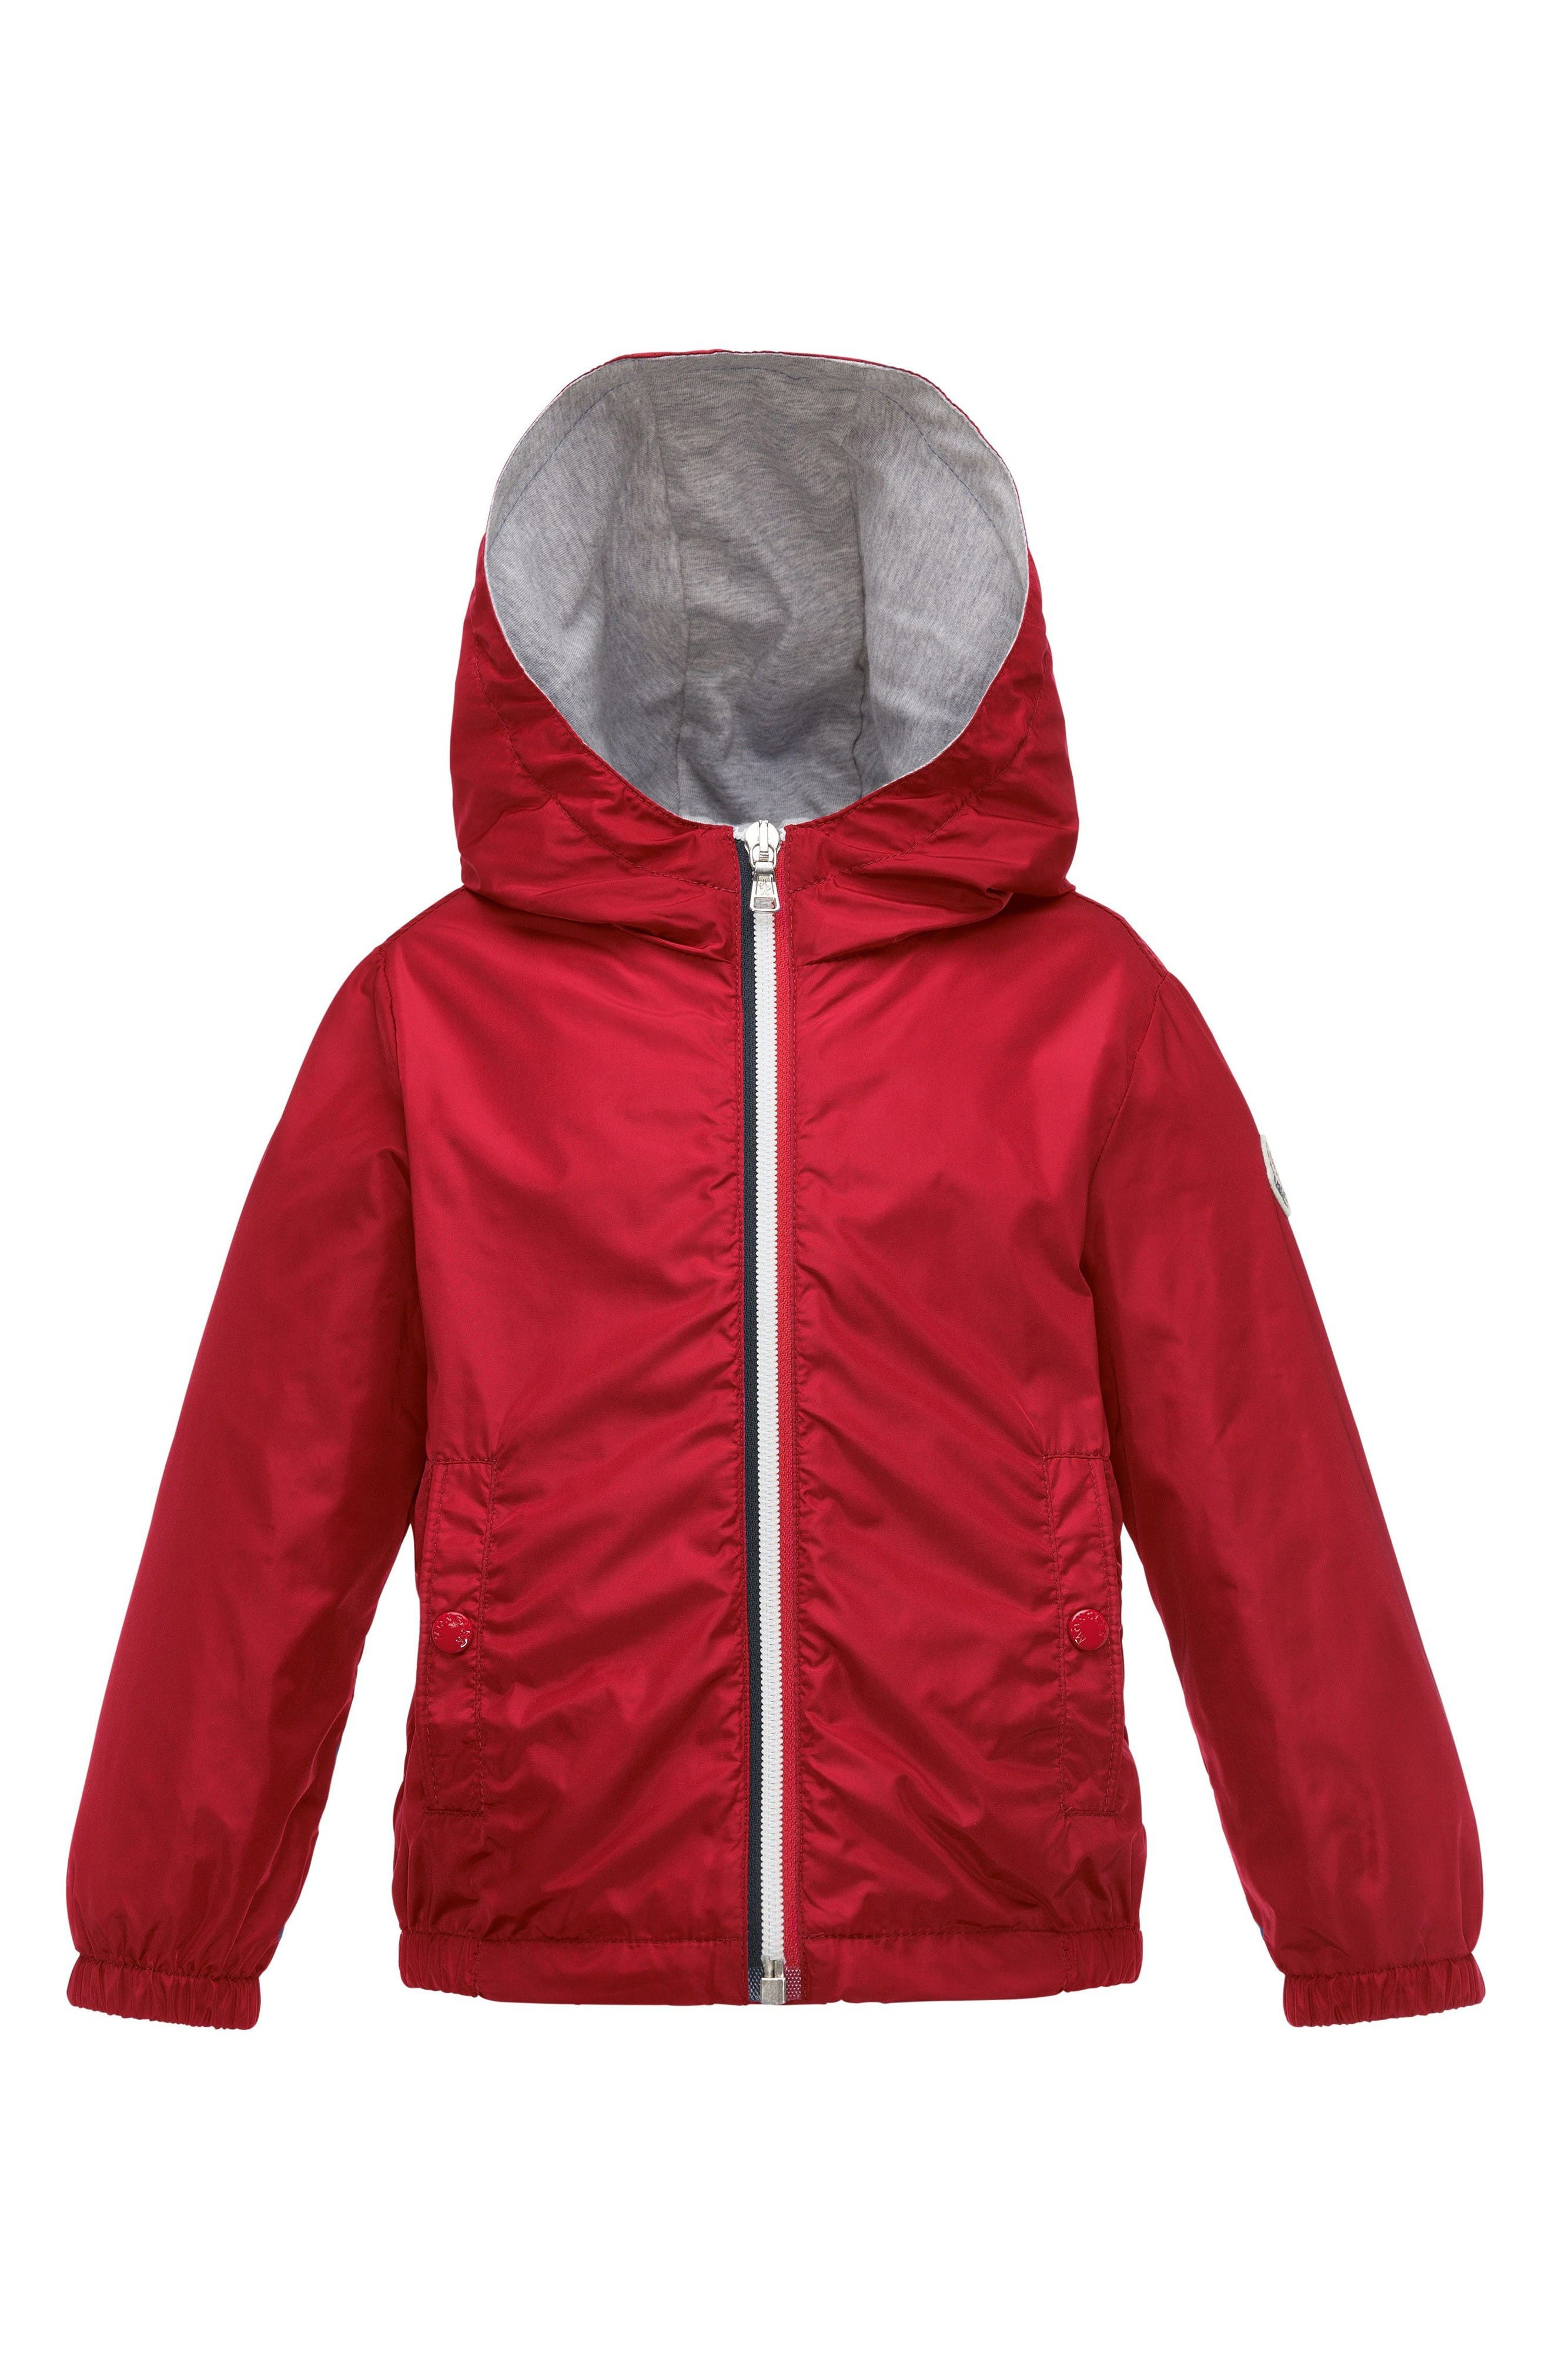 Main Image - Moncler New Urville Water Resistant Windbreaker Jacket (Little Boys & Big Boys)